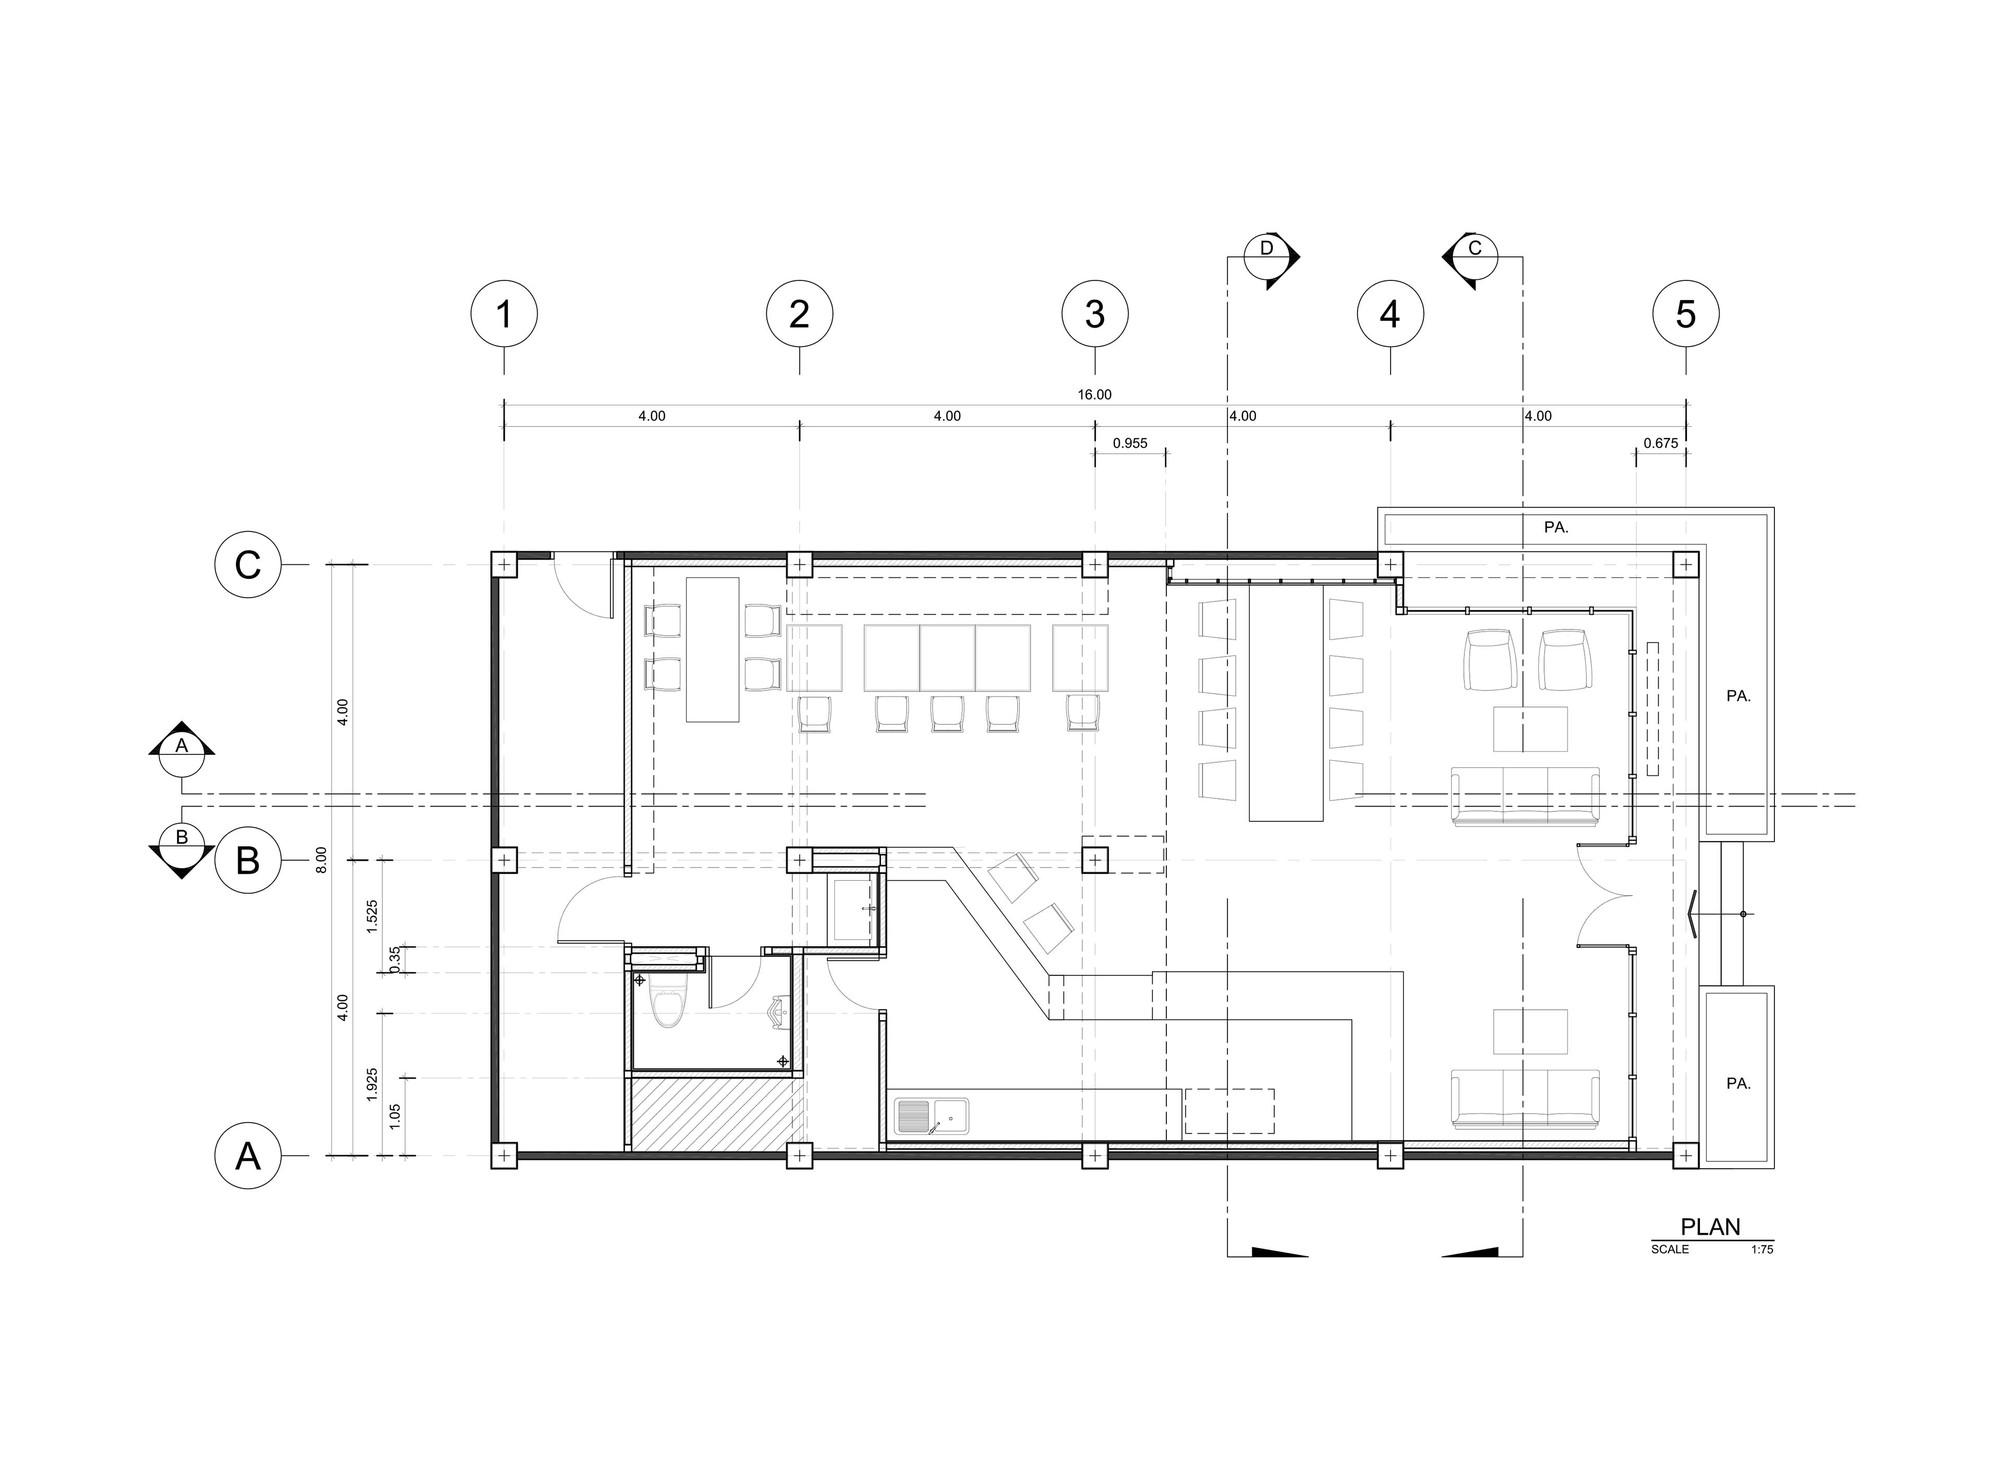 Galeria De Caf 233 Murasaki Fattstudio 10